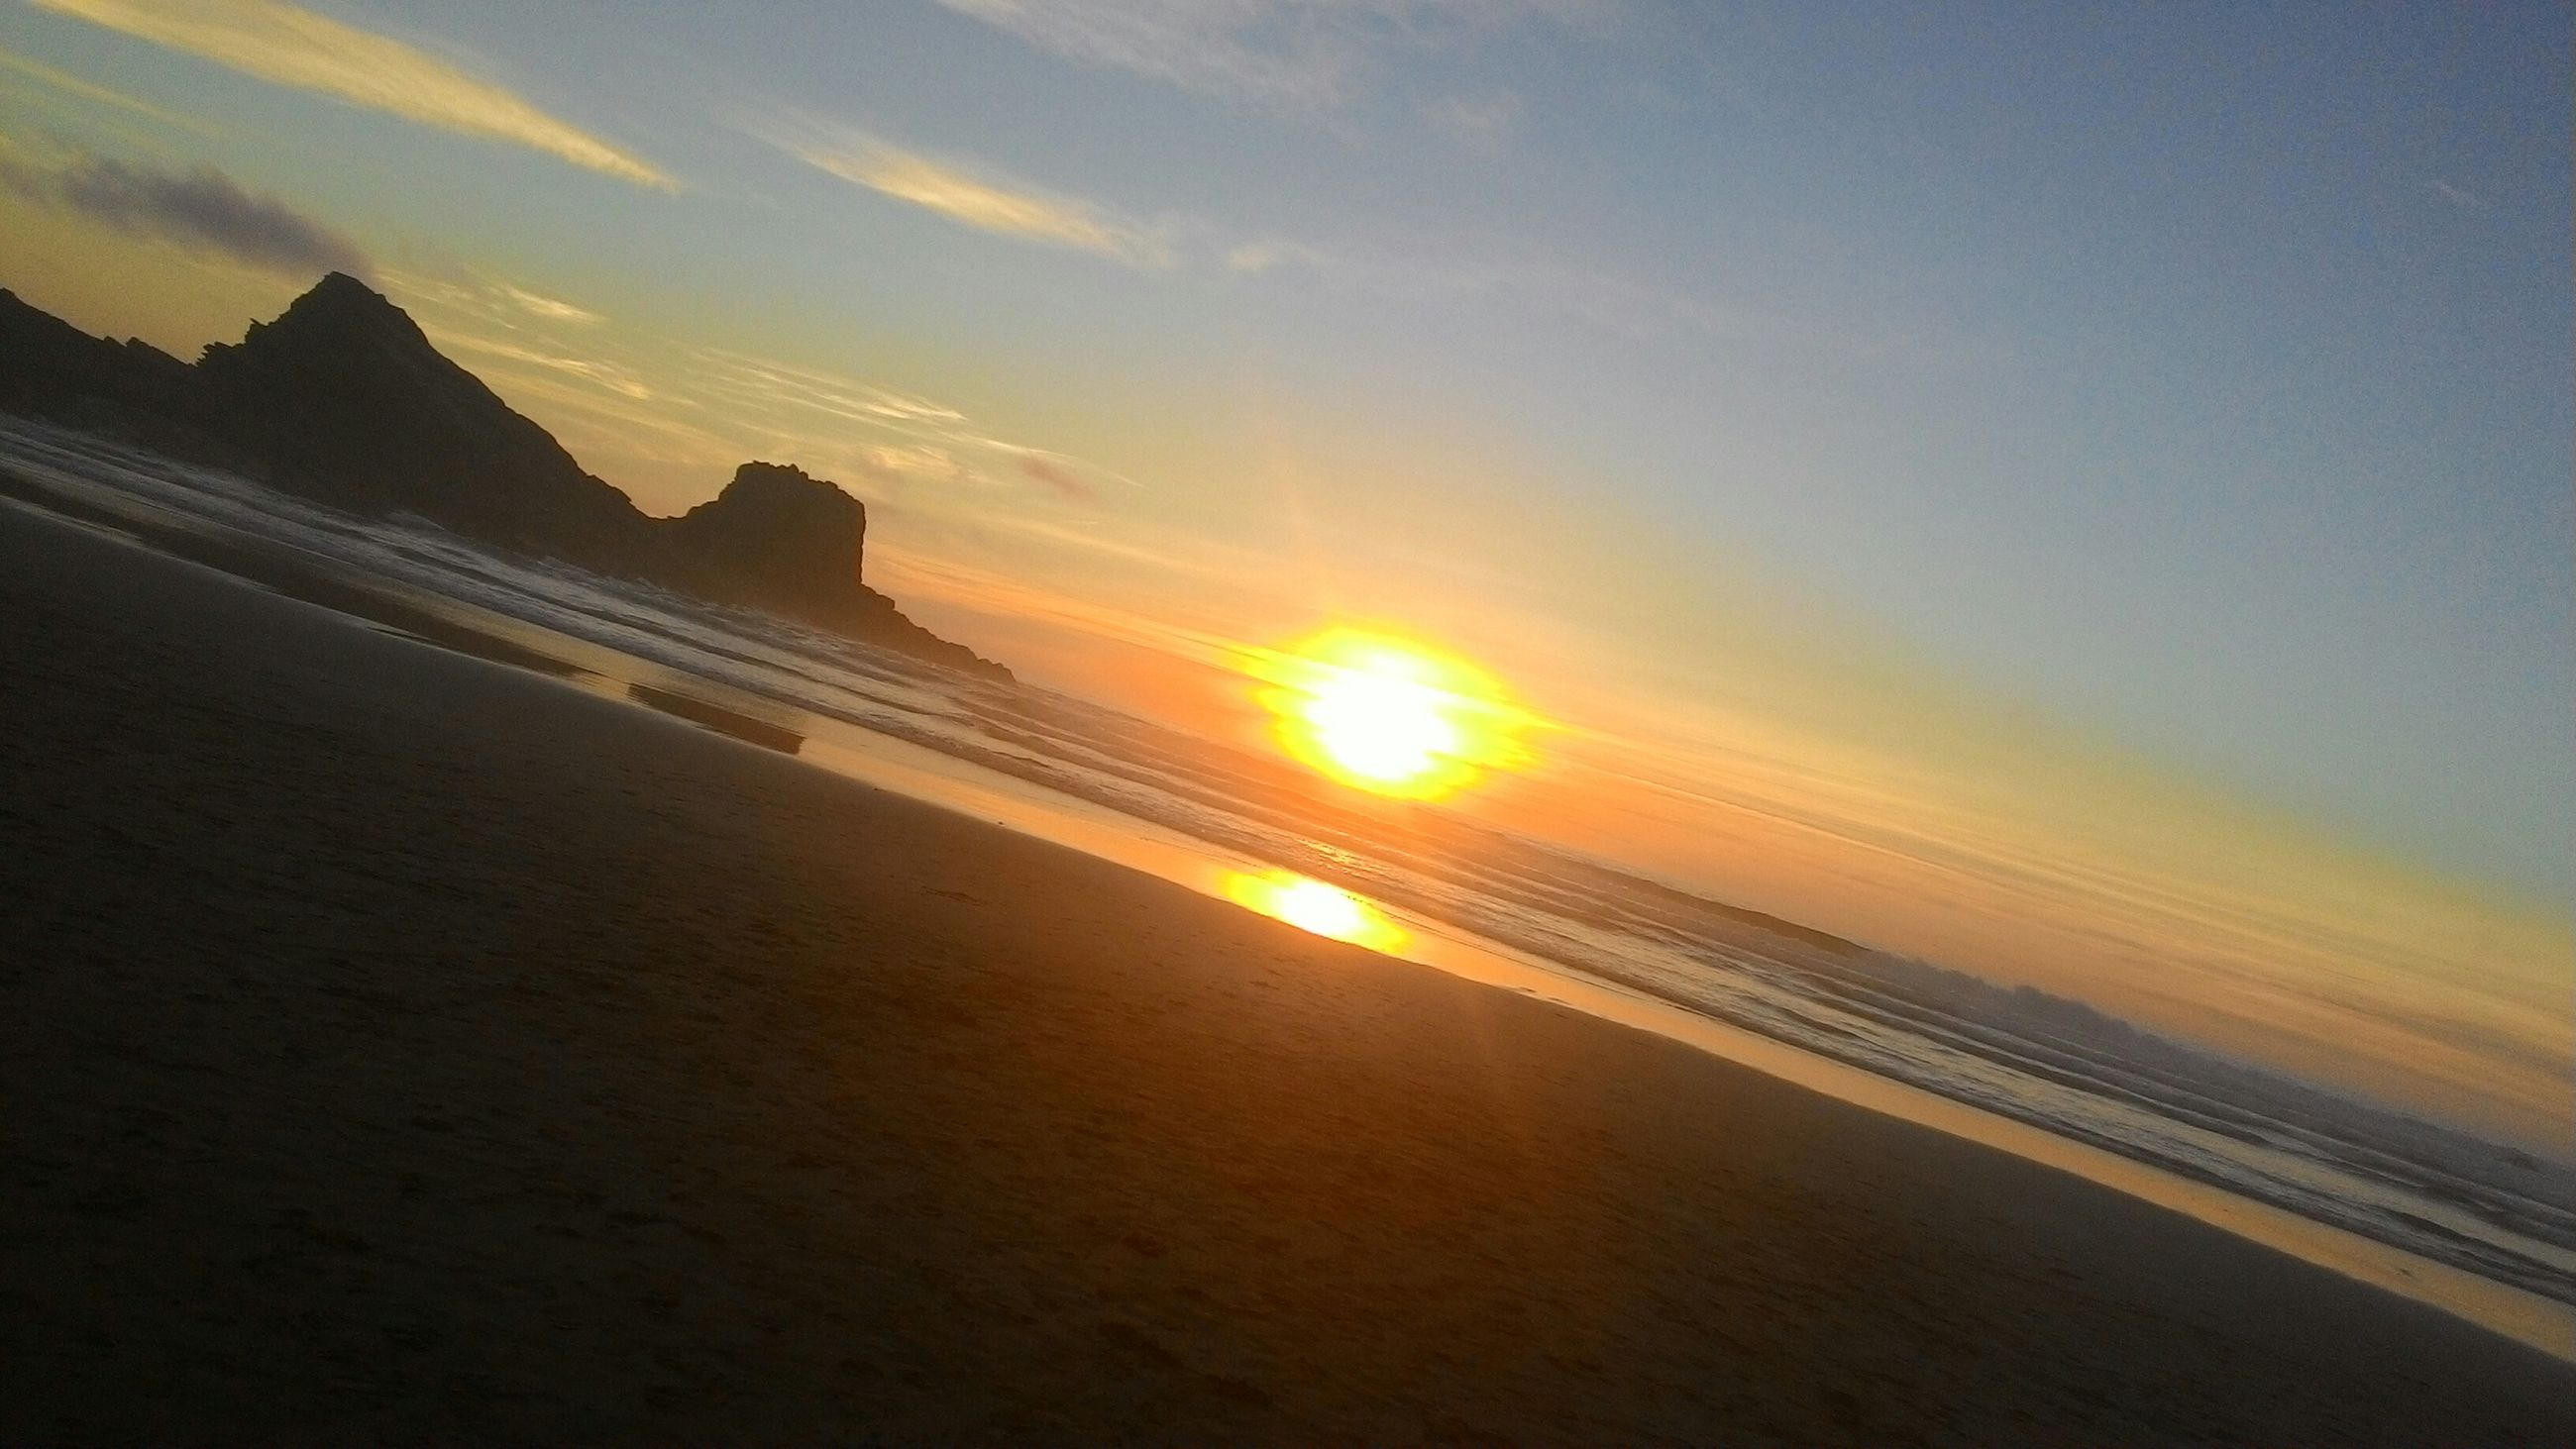 sunset, sun, scenics, sky, beauty in nature, tranquil scene, tranquility, sea, beach, orange color, sunlight, sunbeam, nature, idyllic, built structure, water, cloud - sky, architecture, outdoors, horizon over water